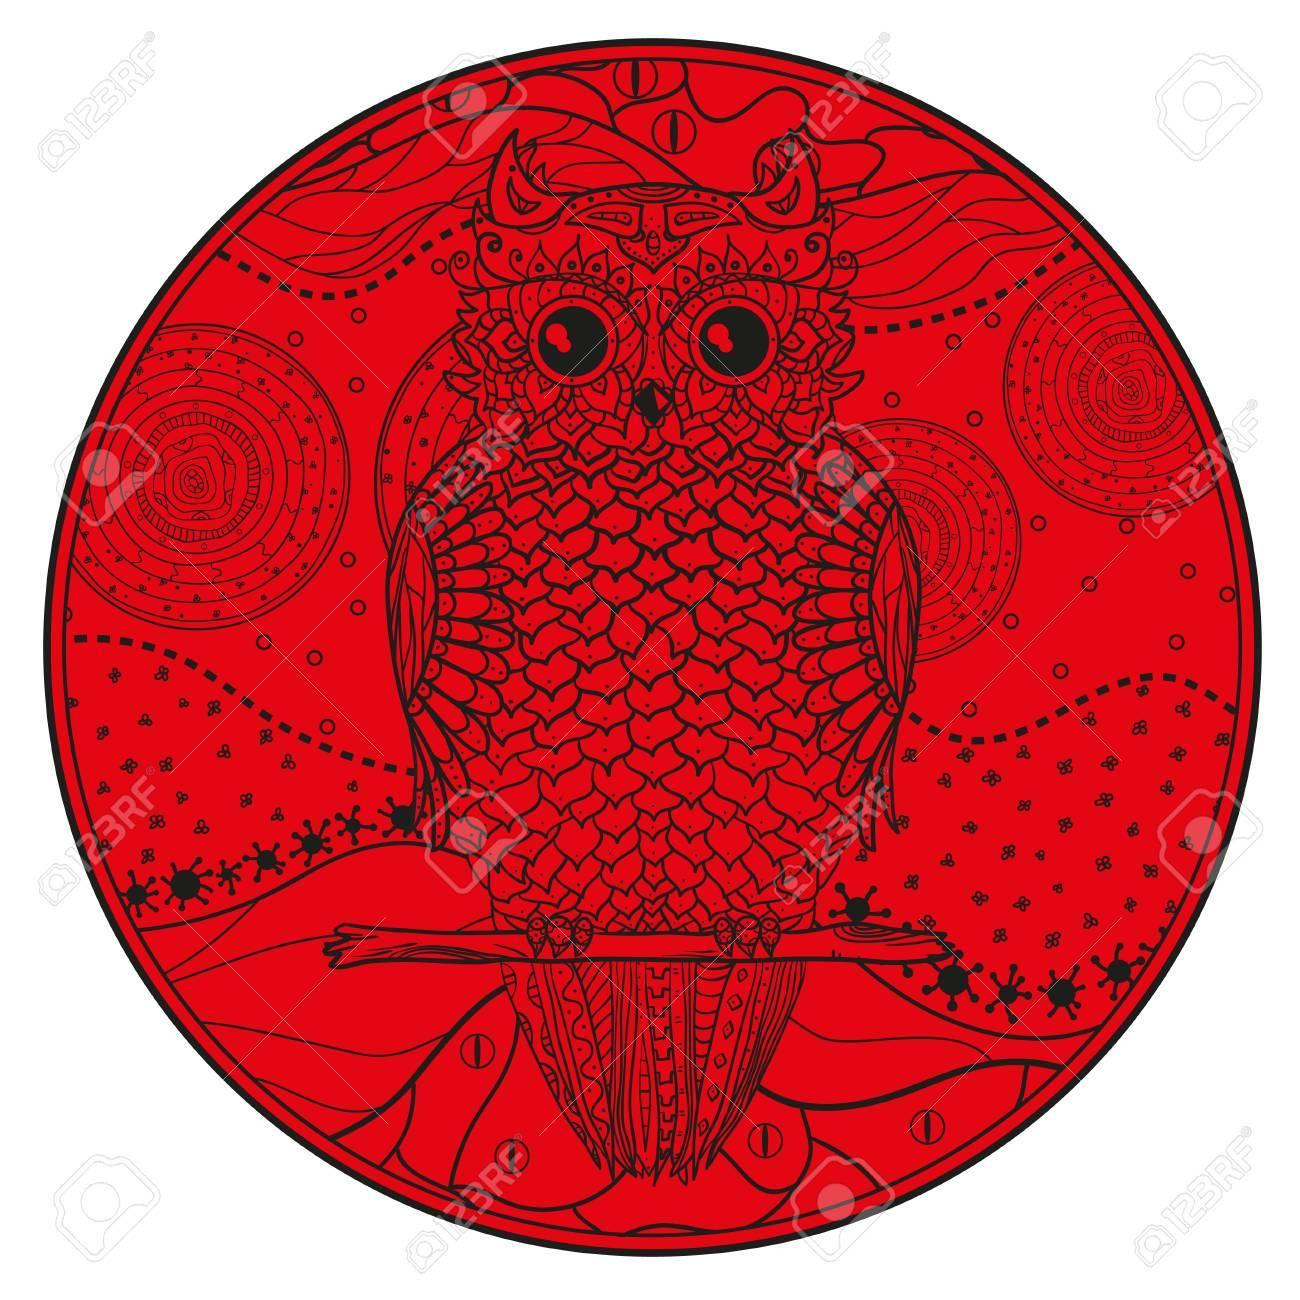 Mandala with owl design zentangle hand drawn abstract patterns hand drawn abstract patterns on isolation background design for spiritual biocorpaavc Choice Image